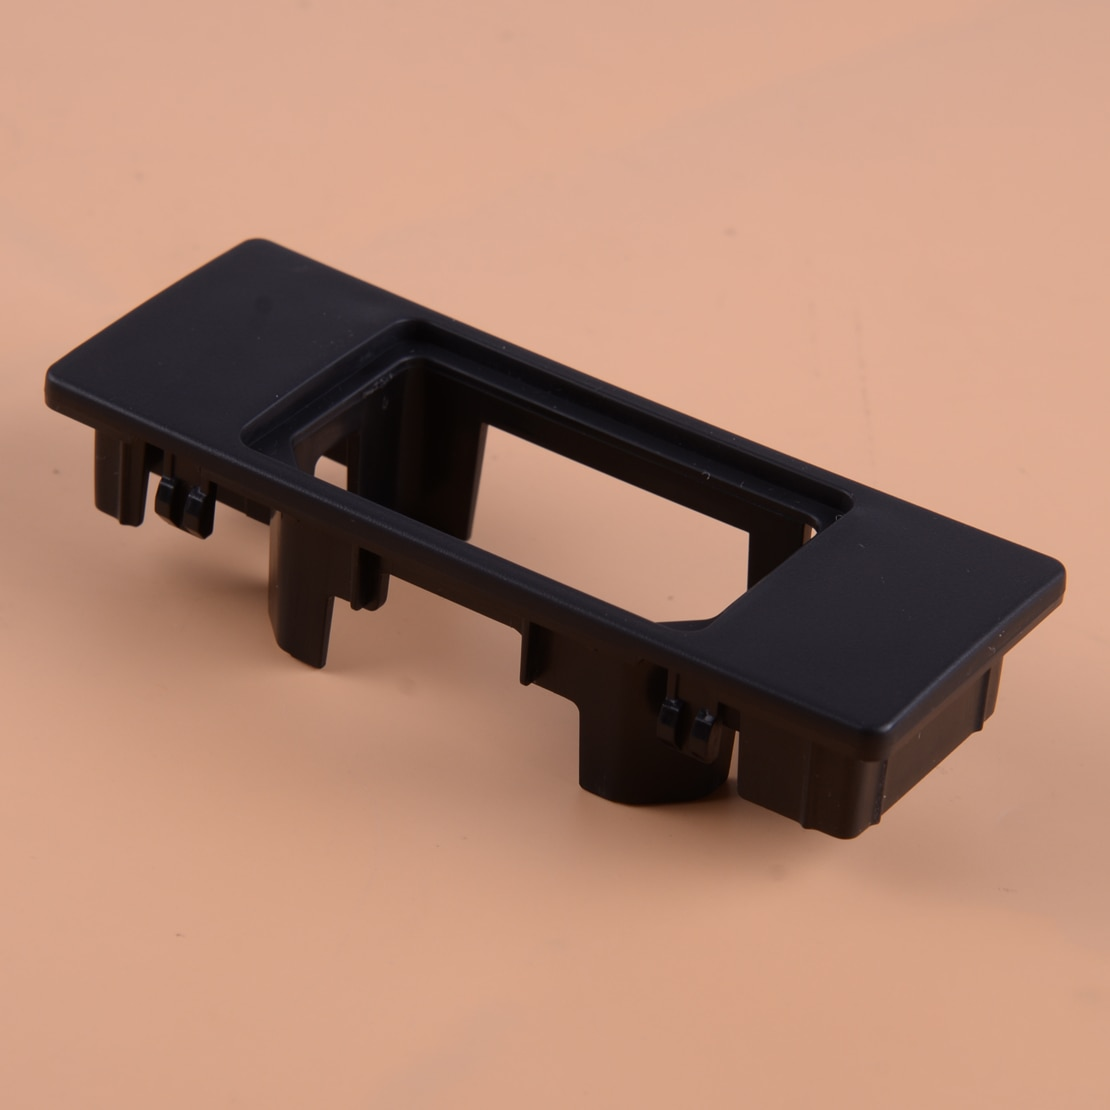 Módulo de interfaz de Carplay USB beler Sync3, cubierta de cubo de caja multimedia, accesorios de plástico negro para coche para Ford